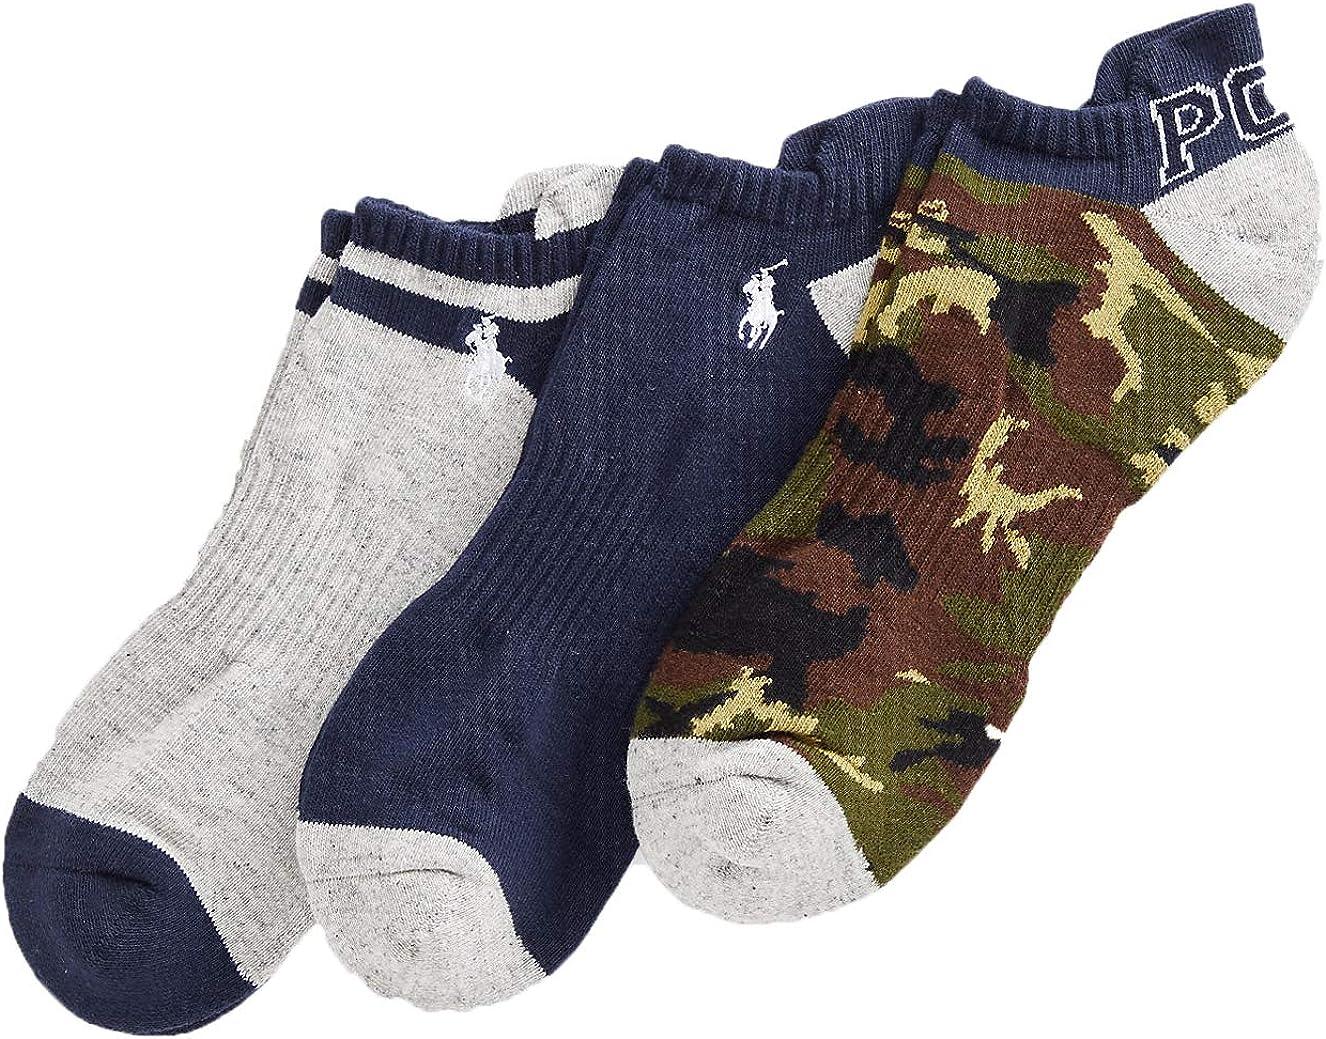 Polo Ralph Lauren Men's Camo Low-Cut Sock 3-Pack Size 10-13